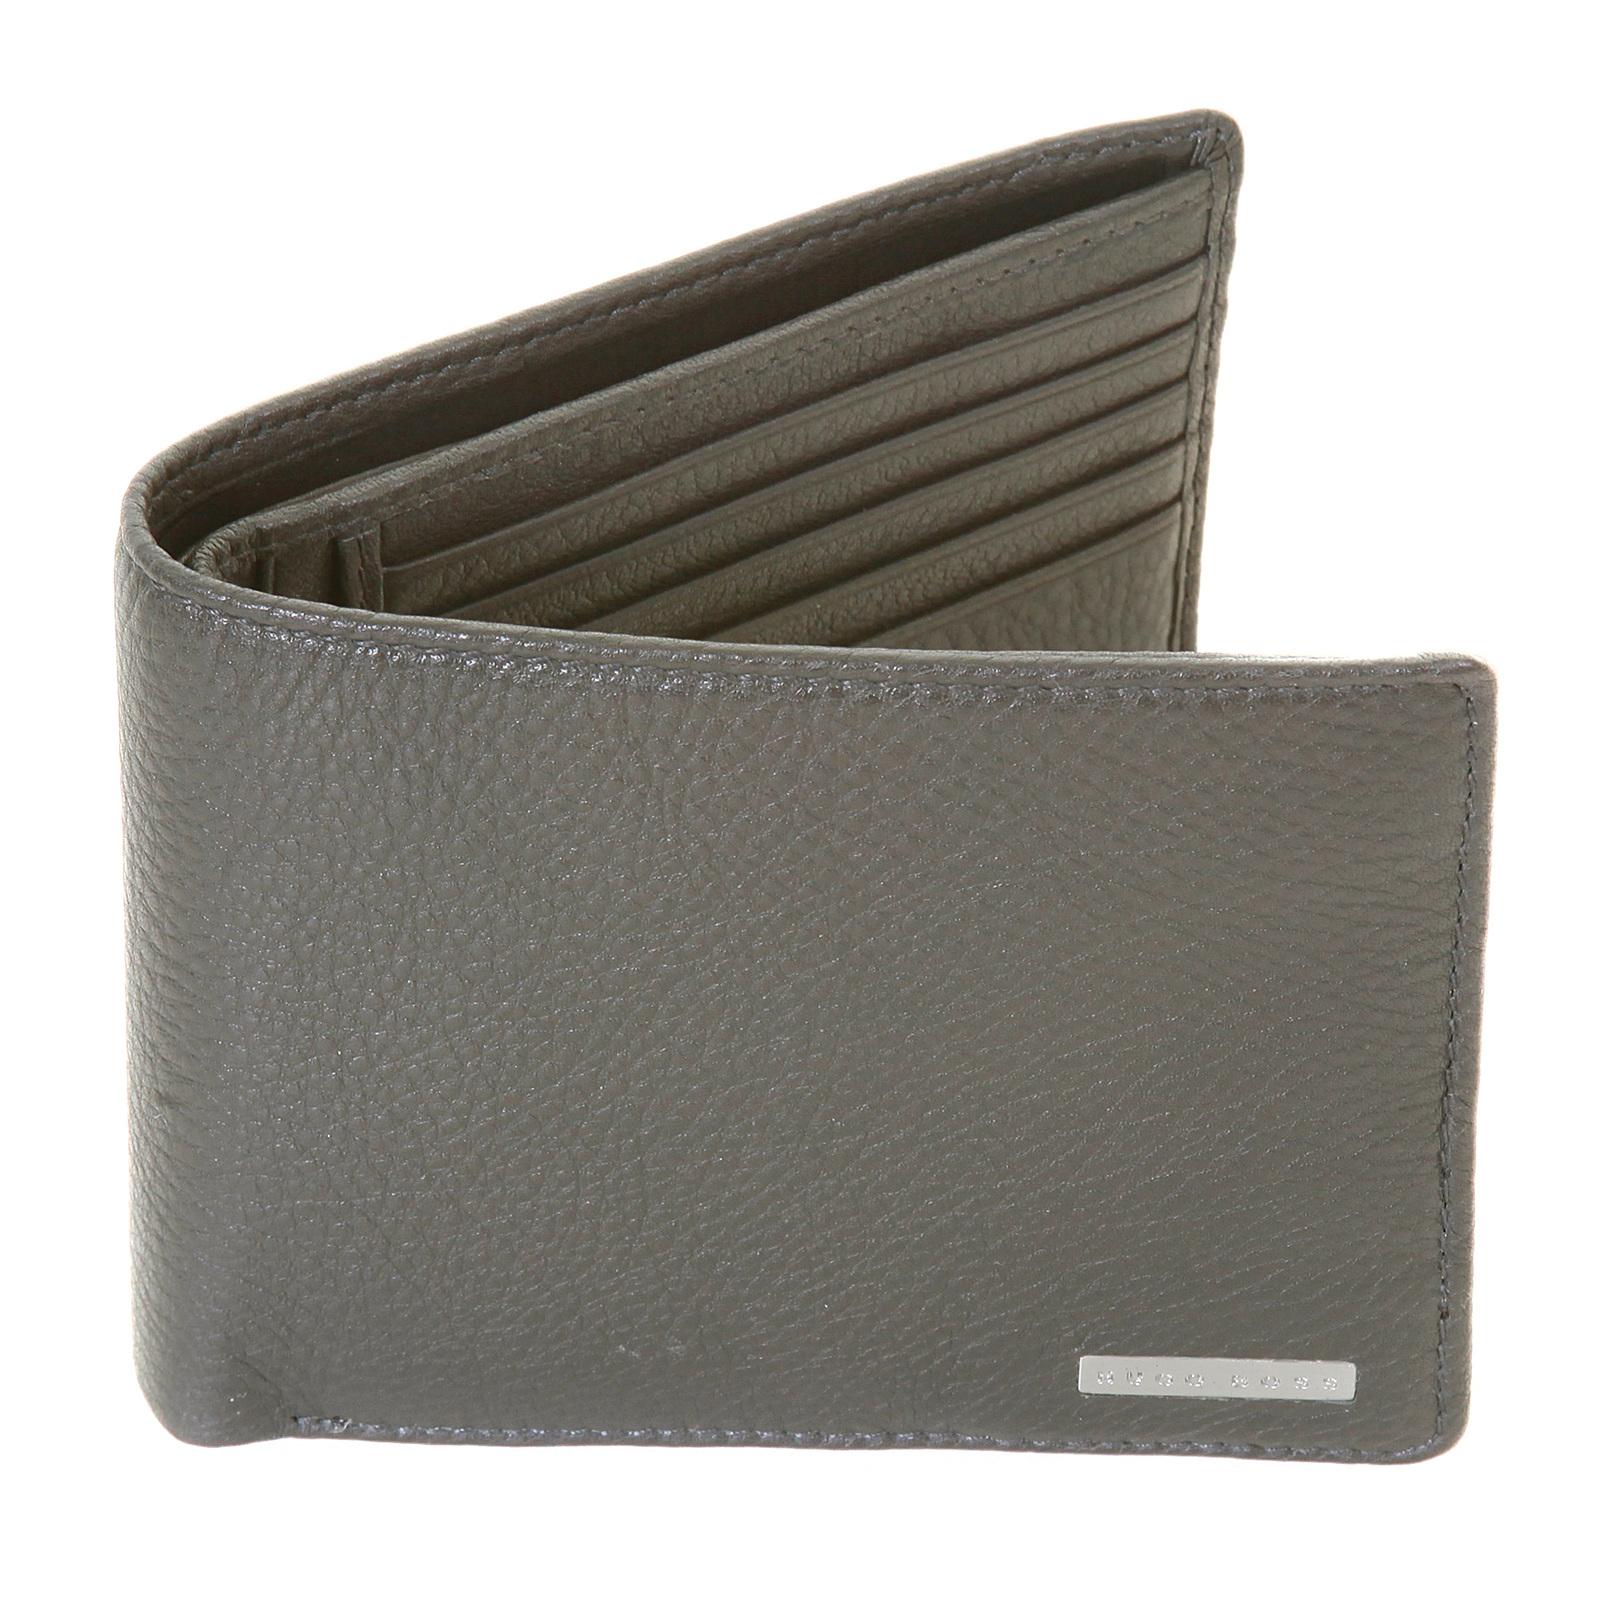 5bf403e4cfca1 Hugo Boss Black label mens Bengi 50205407 boxed grey leather wallet  BOSS0974 at Togged Clothing